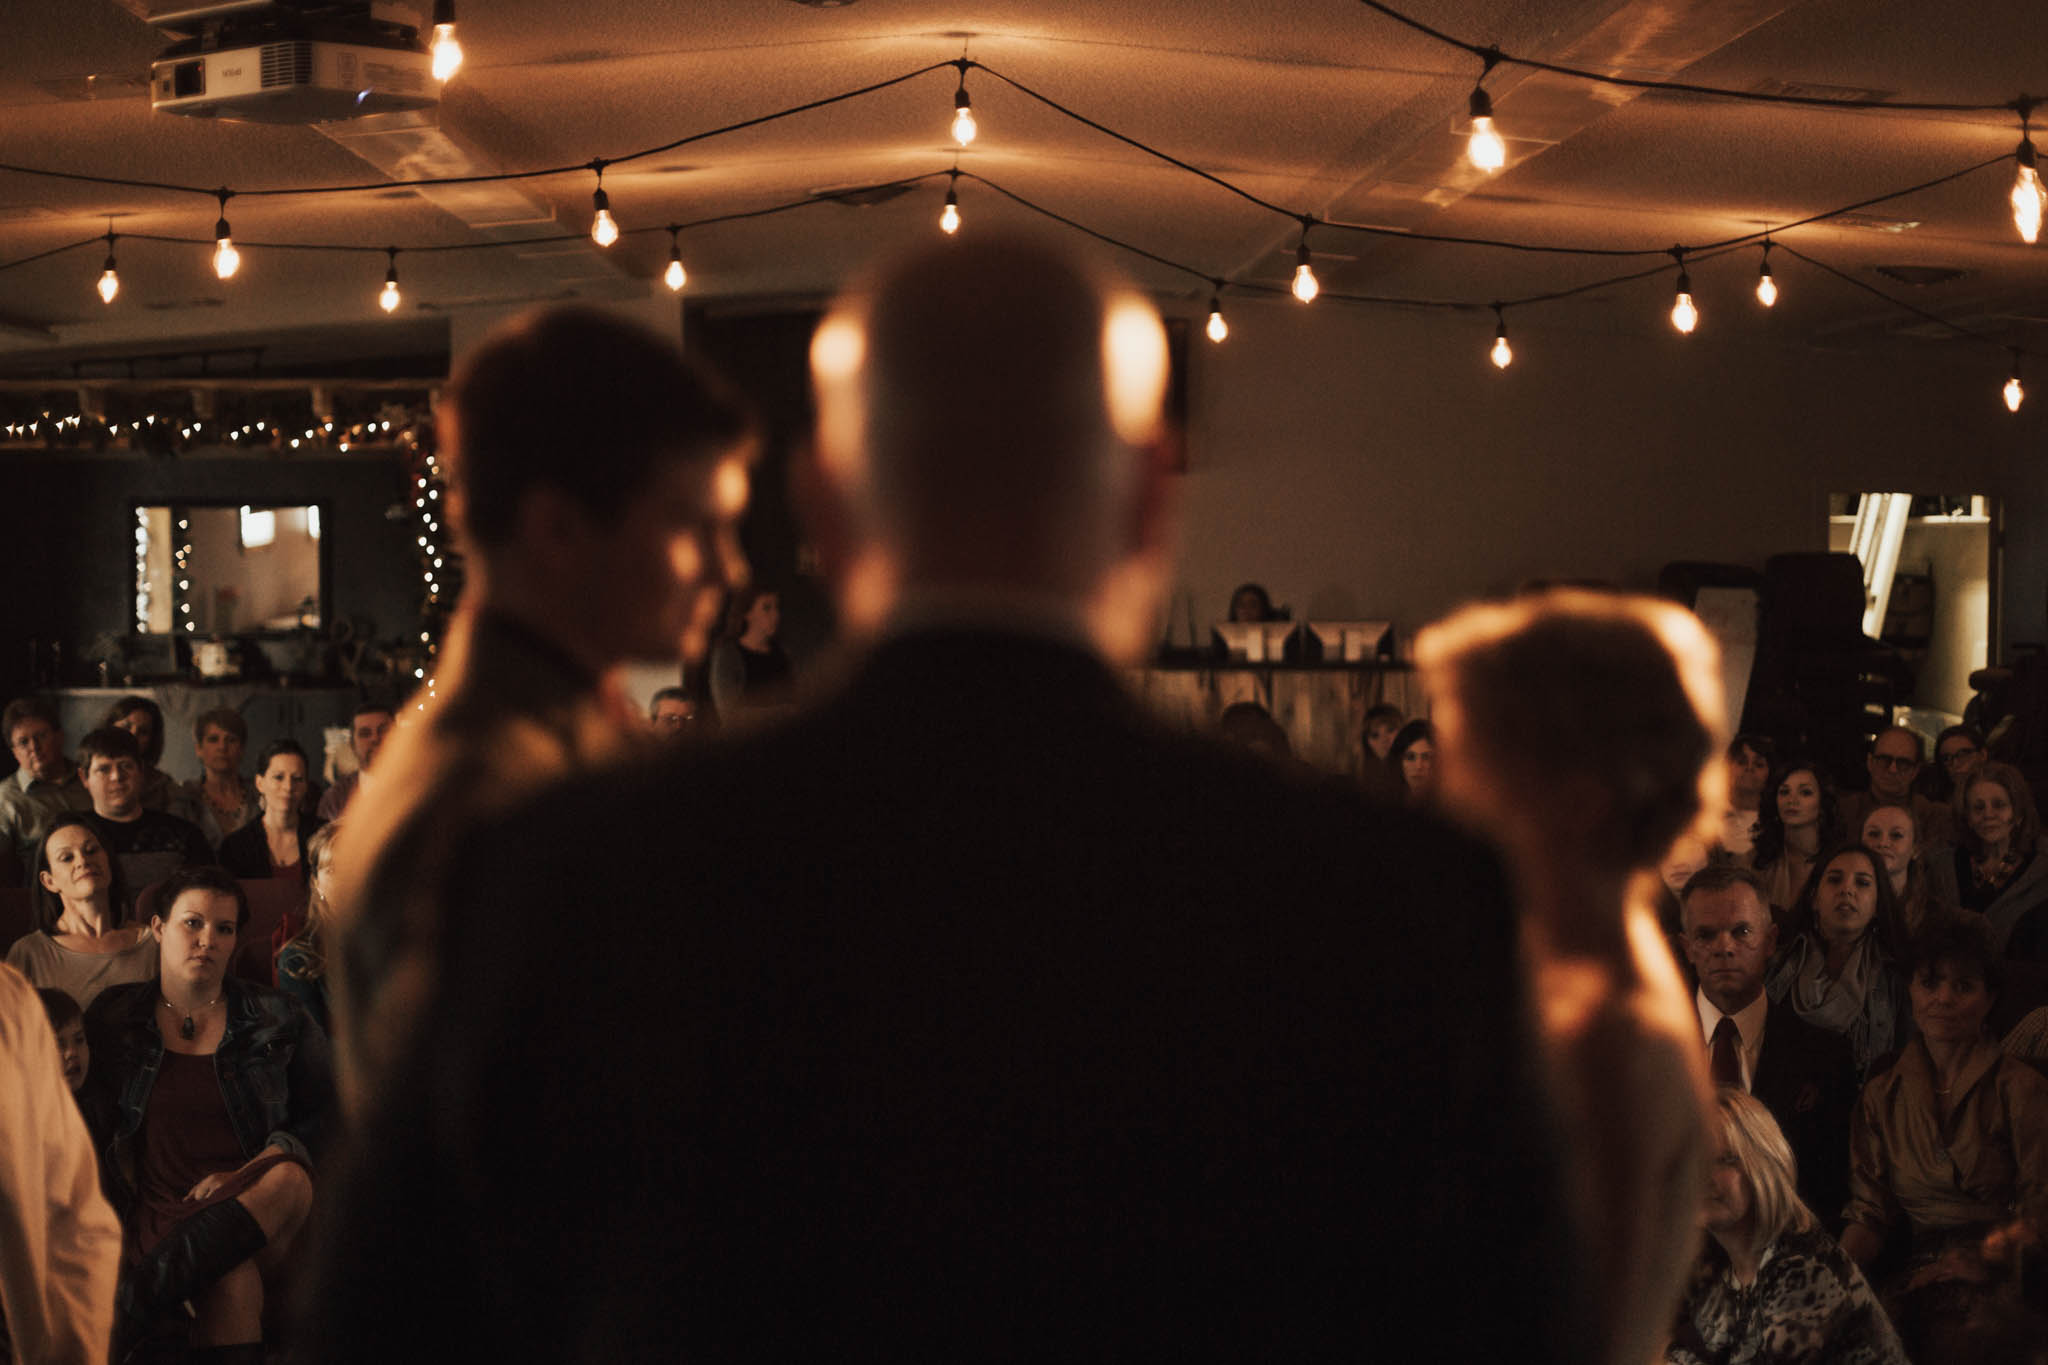 Wedding Photography, Redden Photography, Colorado Wedding, Oregon Wedding, Oregon Wedding Photography, Elopements, Elopement Photographer, Destination Weddings, Destination Wedding Photographer,Oregon Wedding Photographer, Portland Wedding Photographer